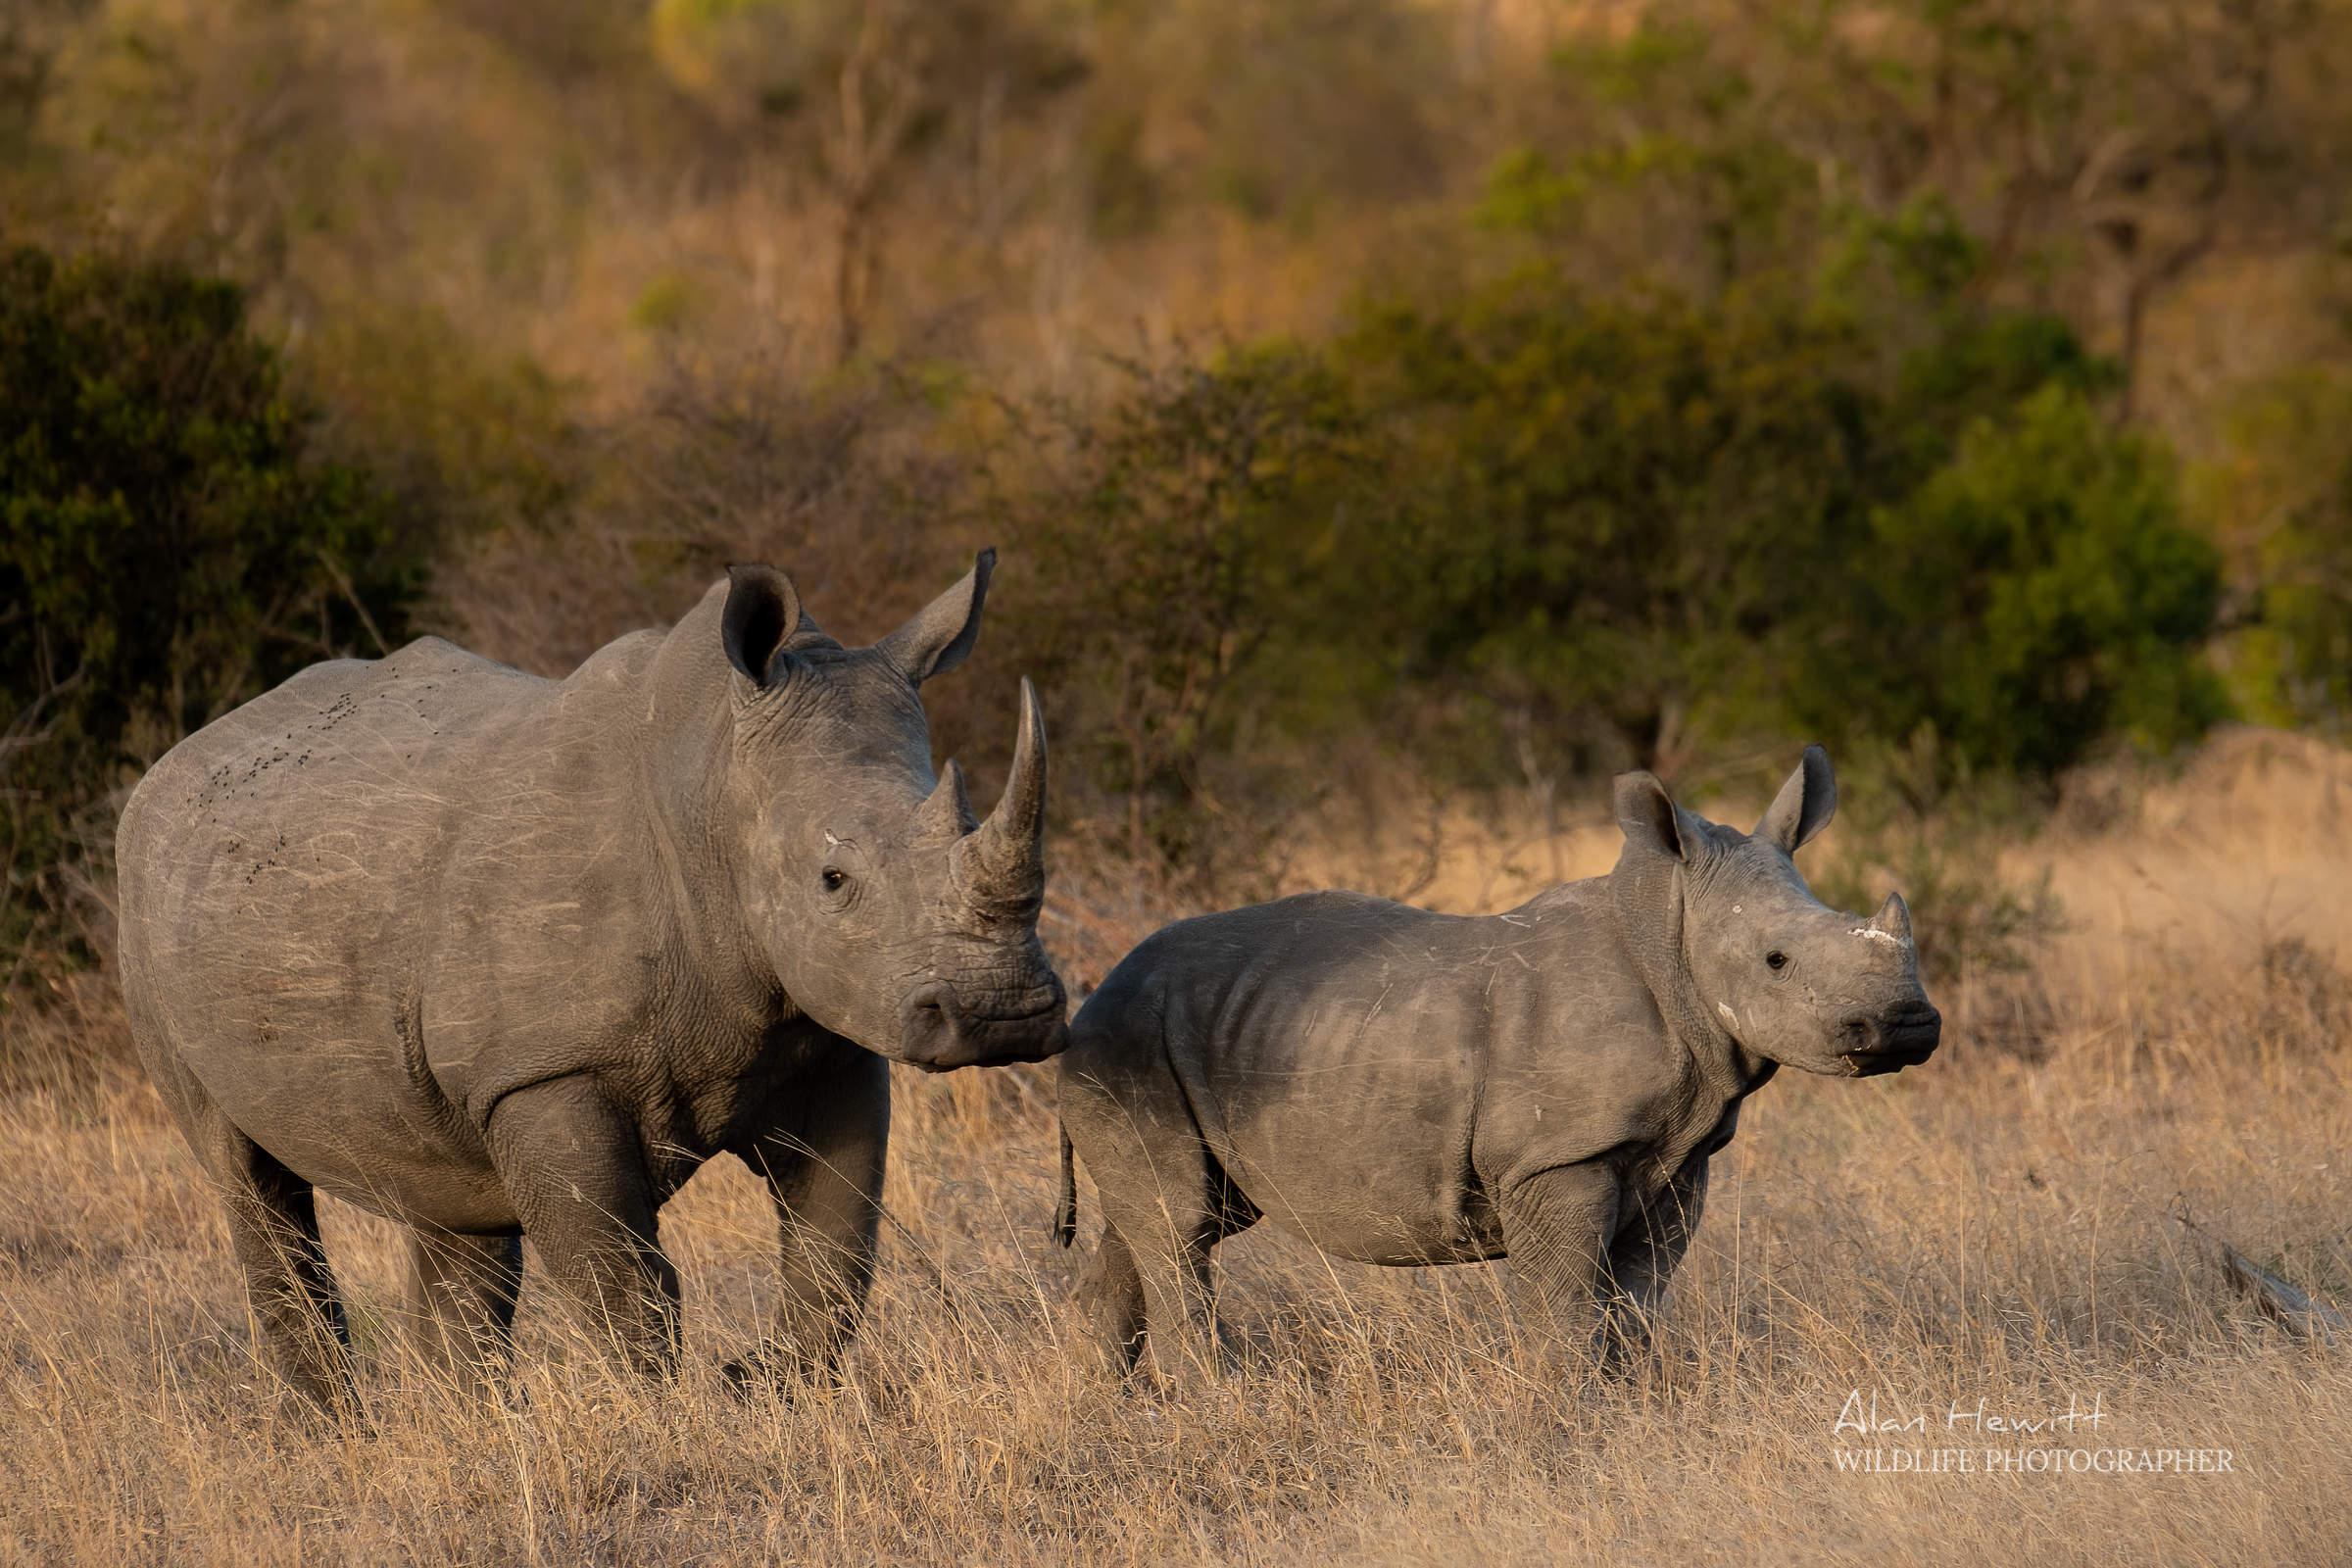 African Wildlife Photography Safaris Alan Hewitt and Kaleel Zibe